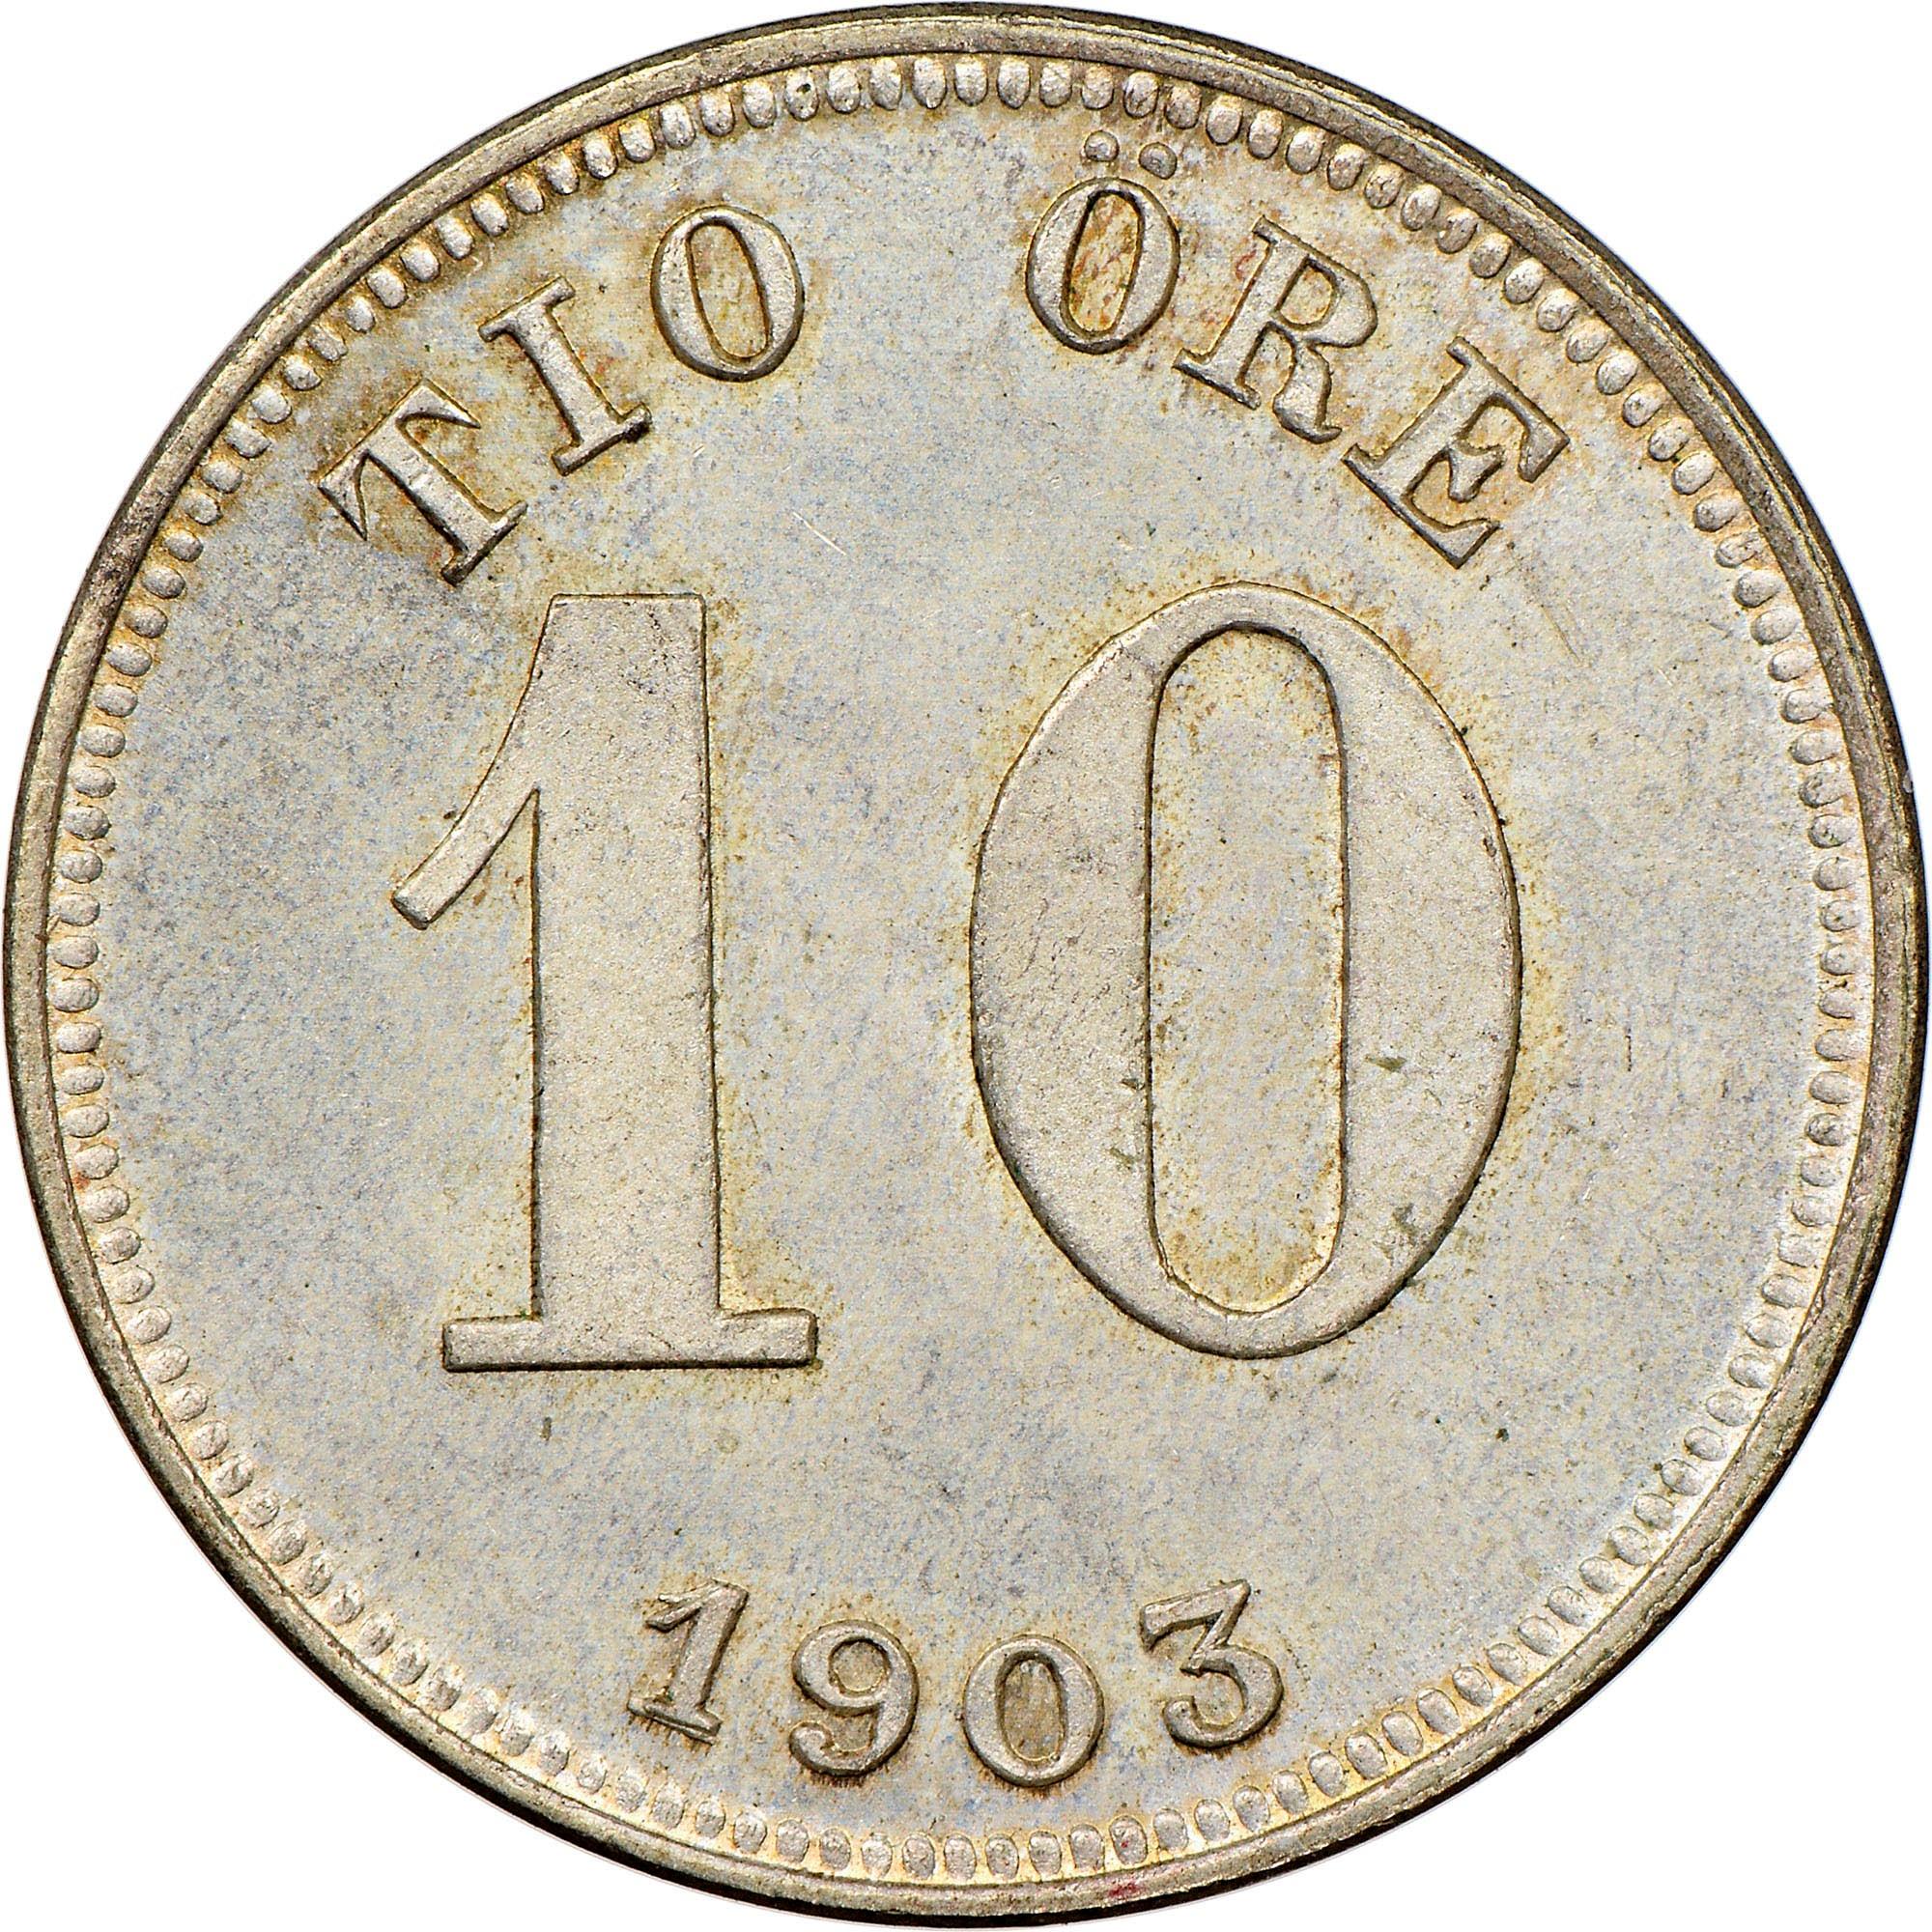 1205----1882 Swedish 10 ore coin